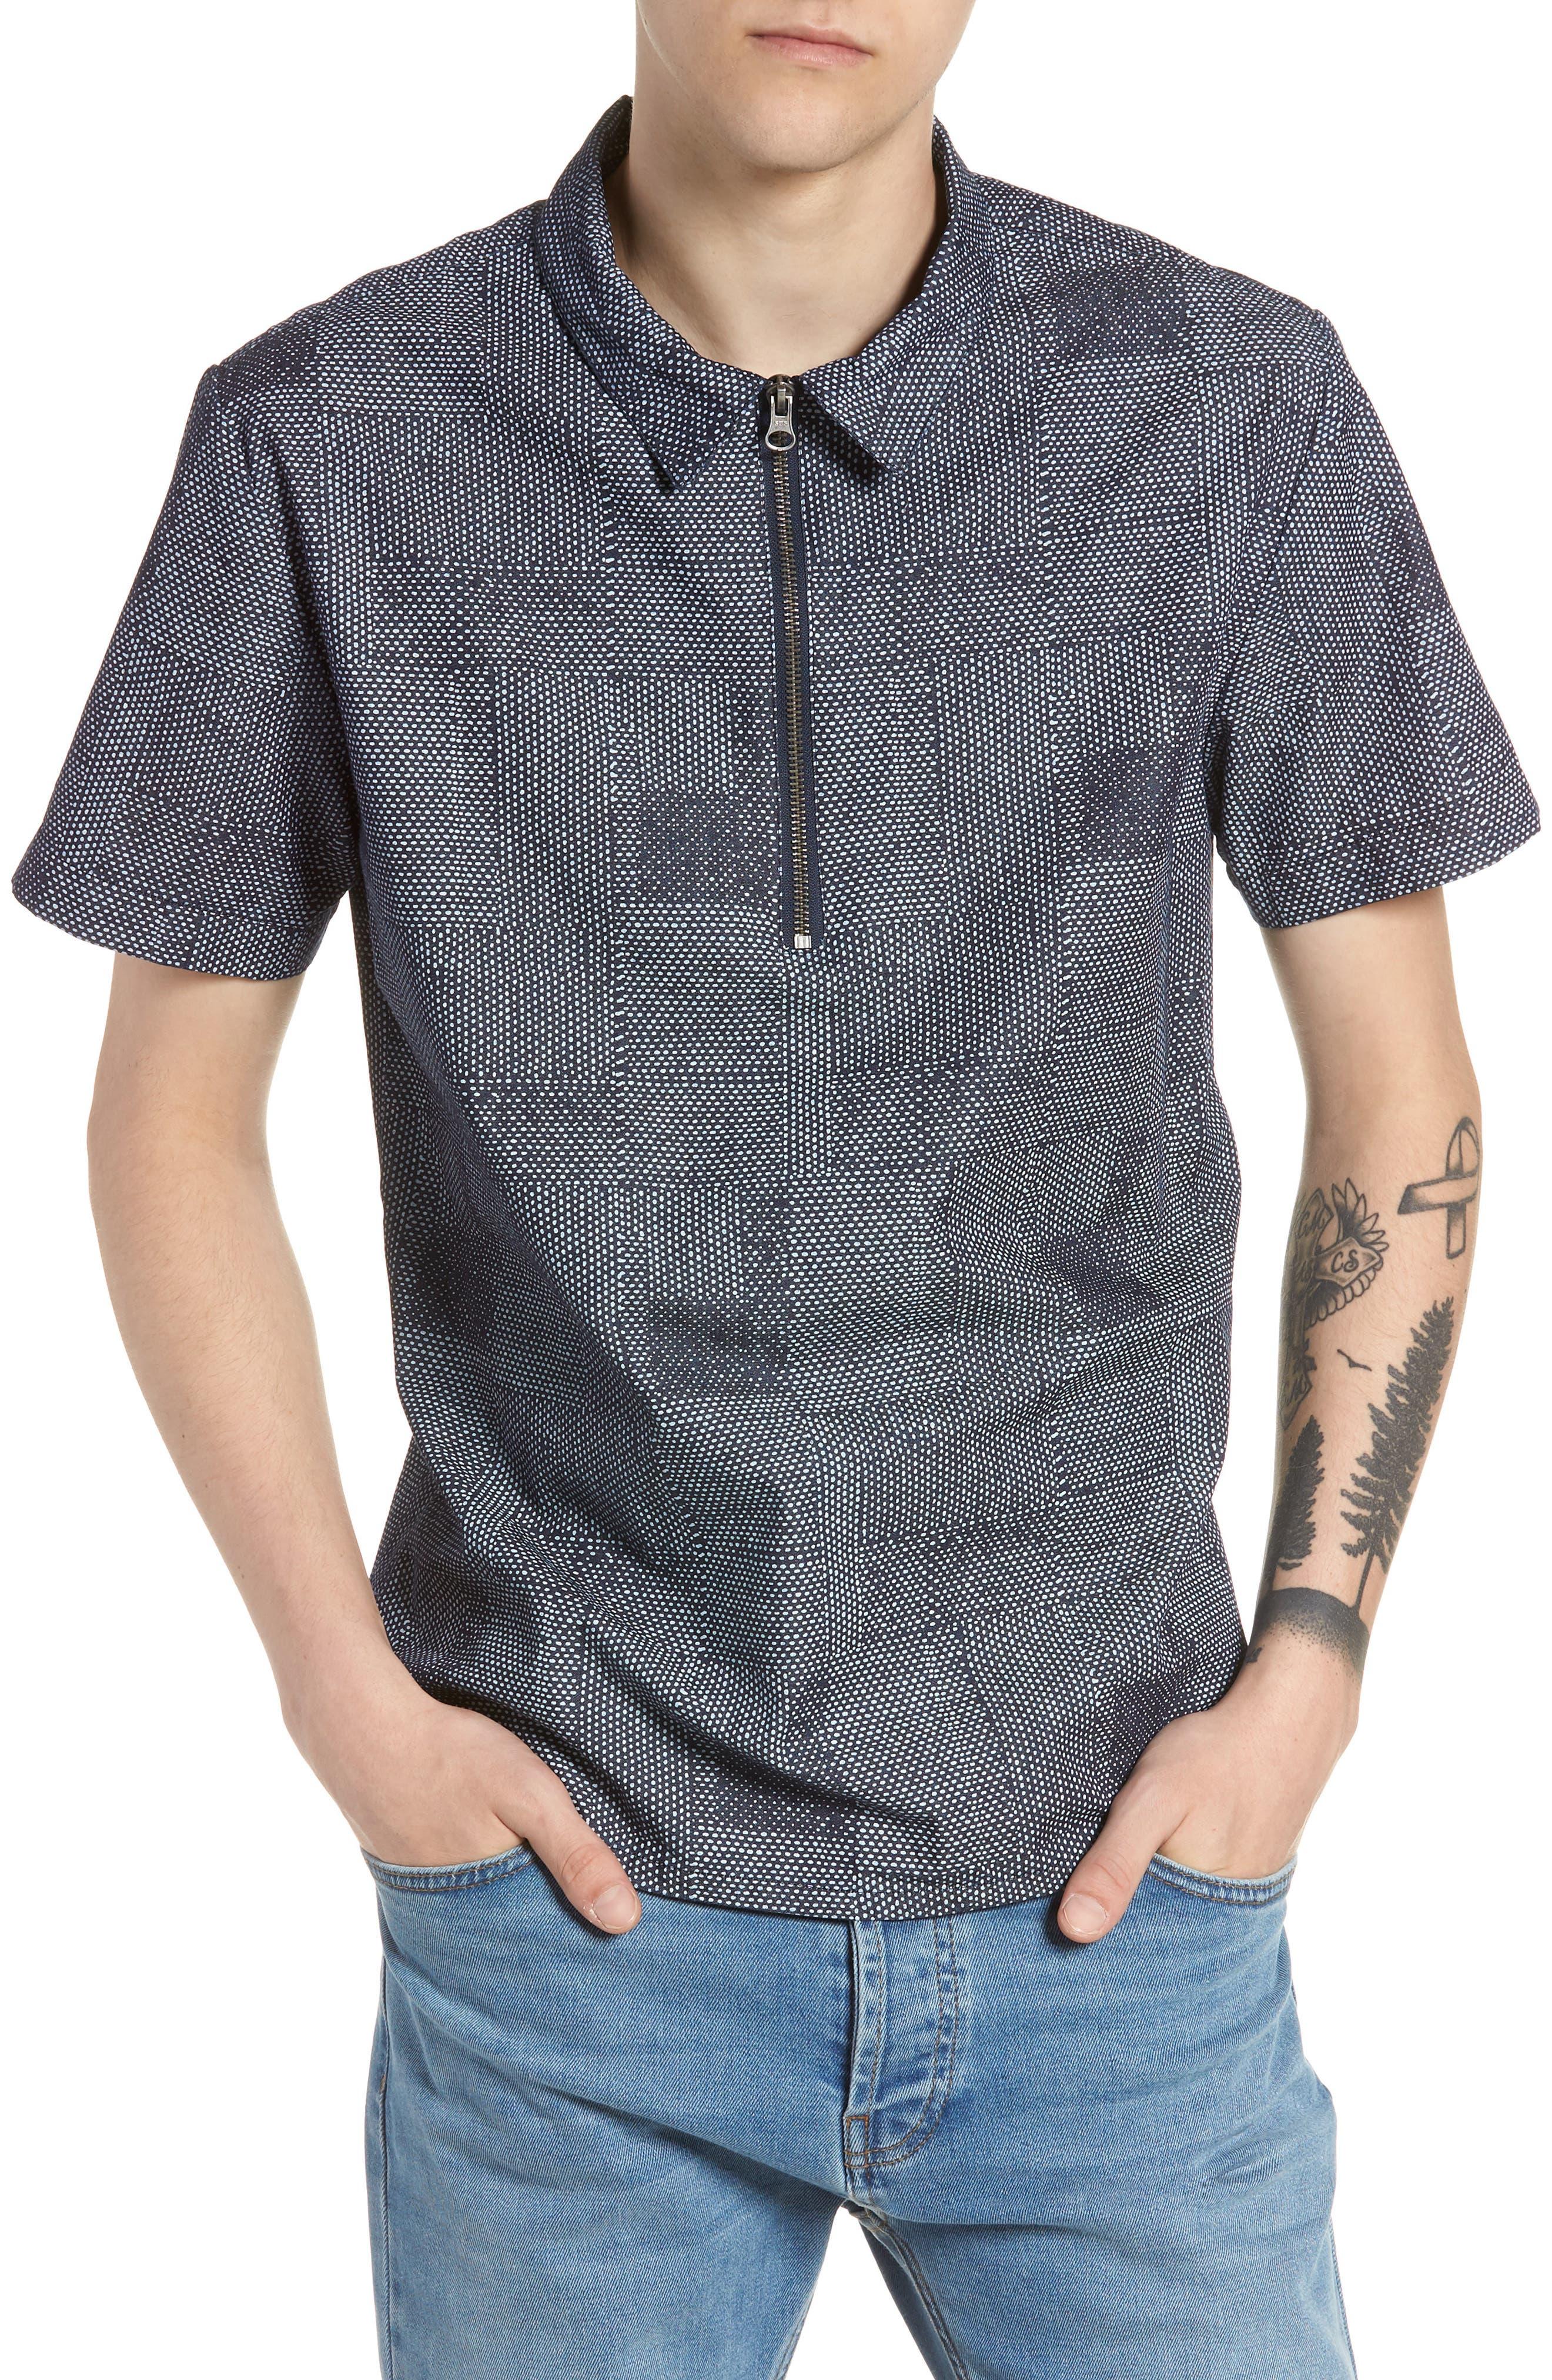 Dotpatch Woven Shirt,                         Main,                         color, INDIGO